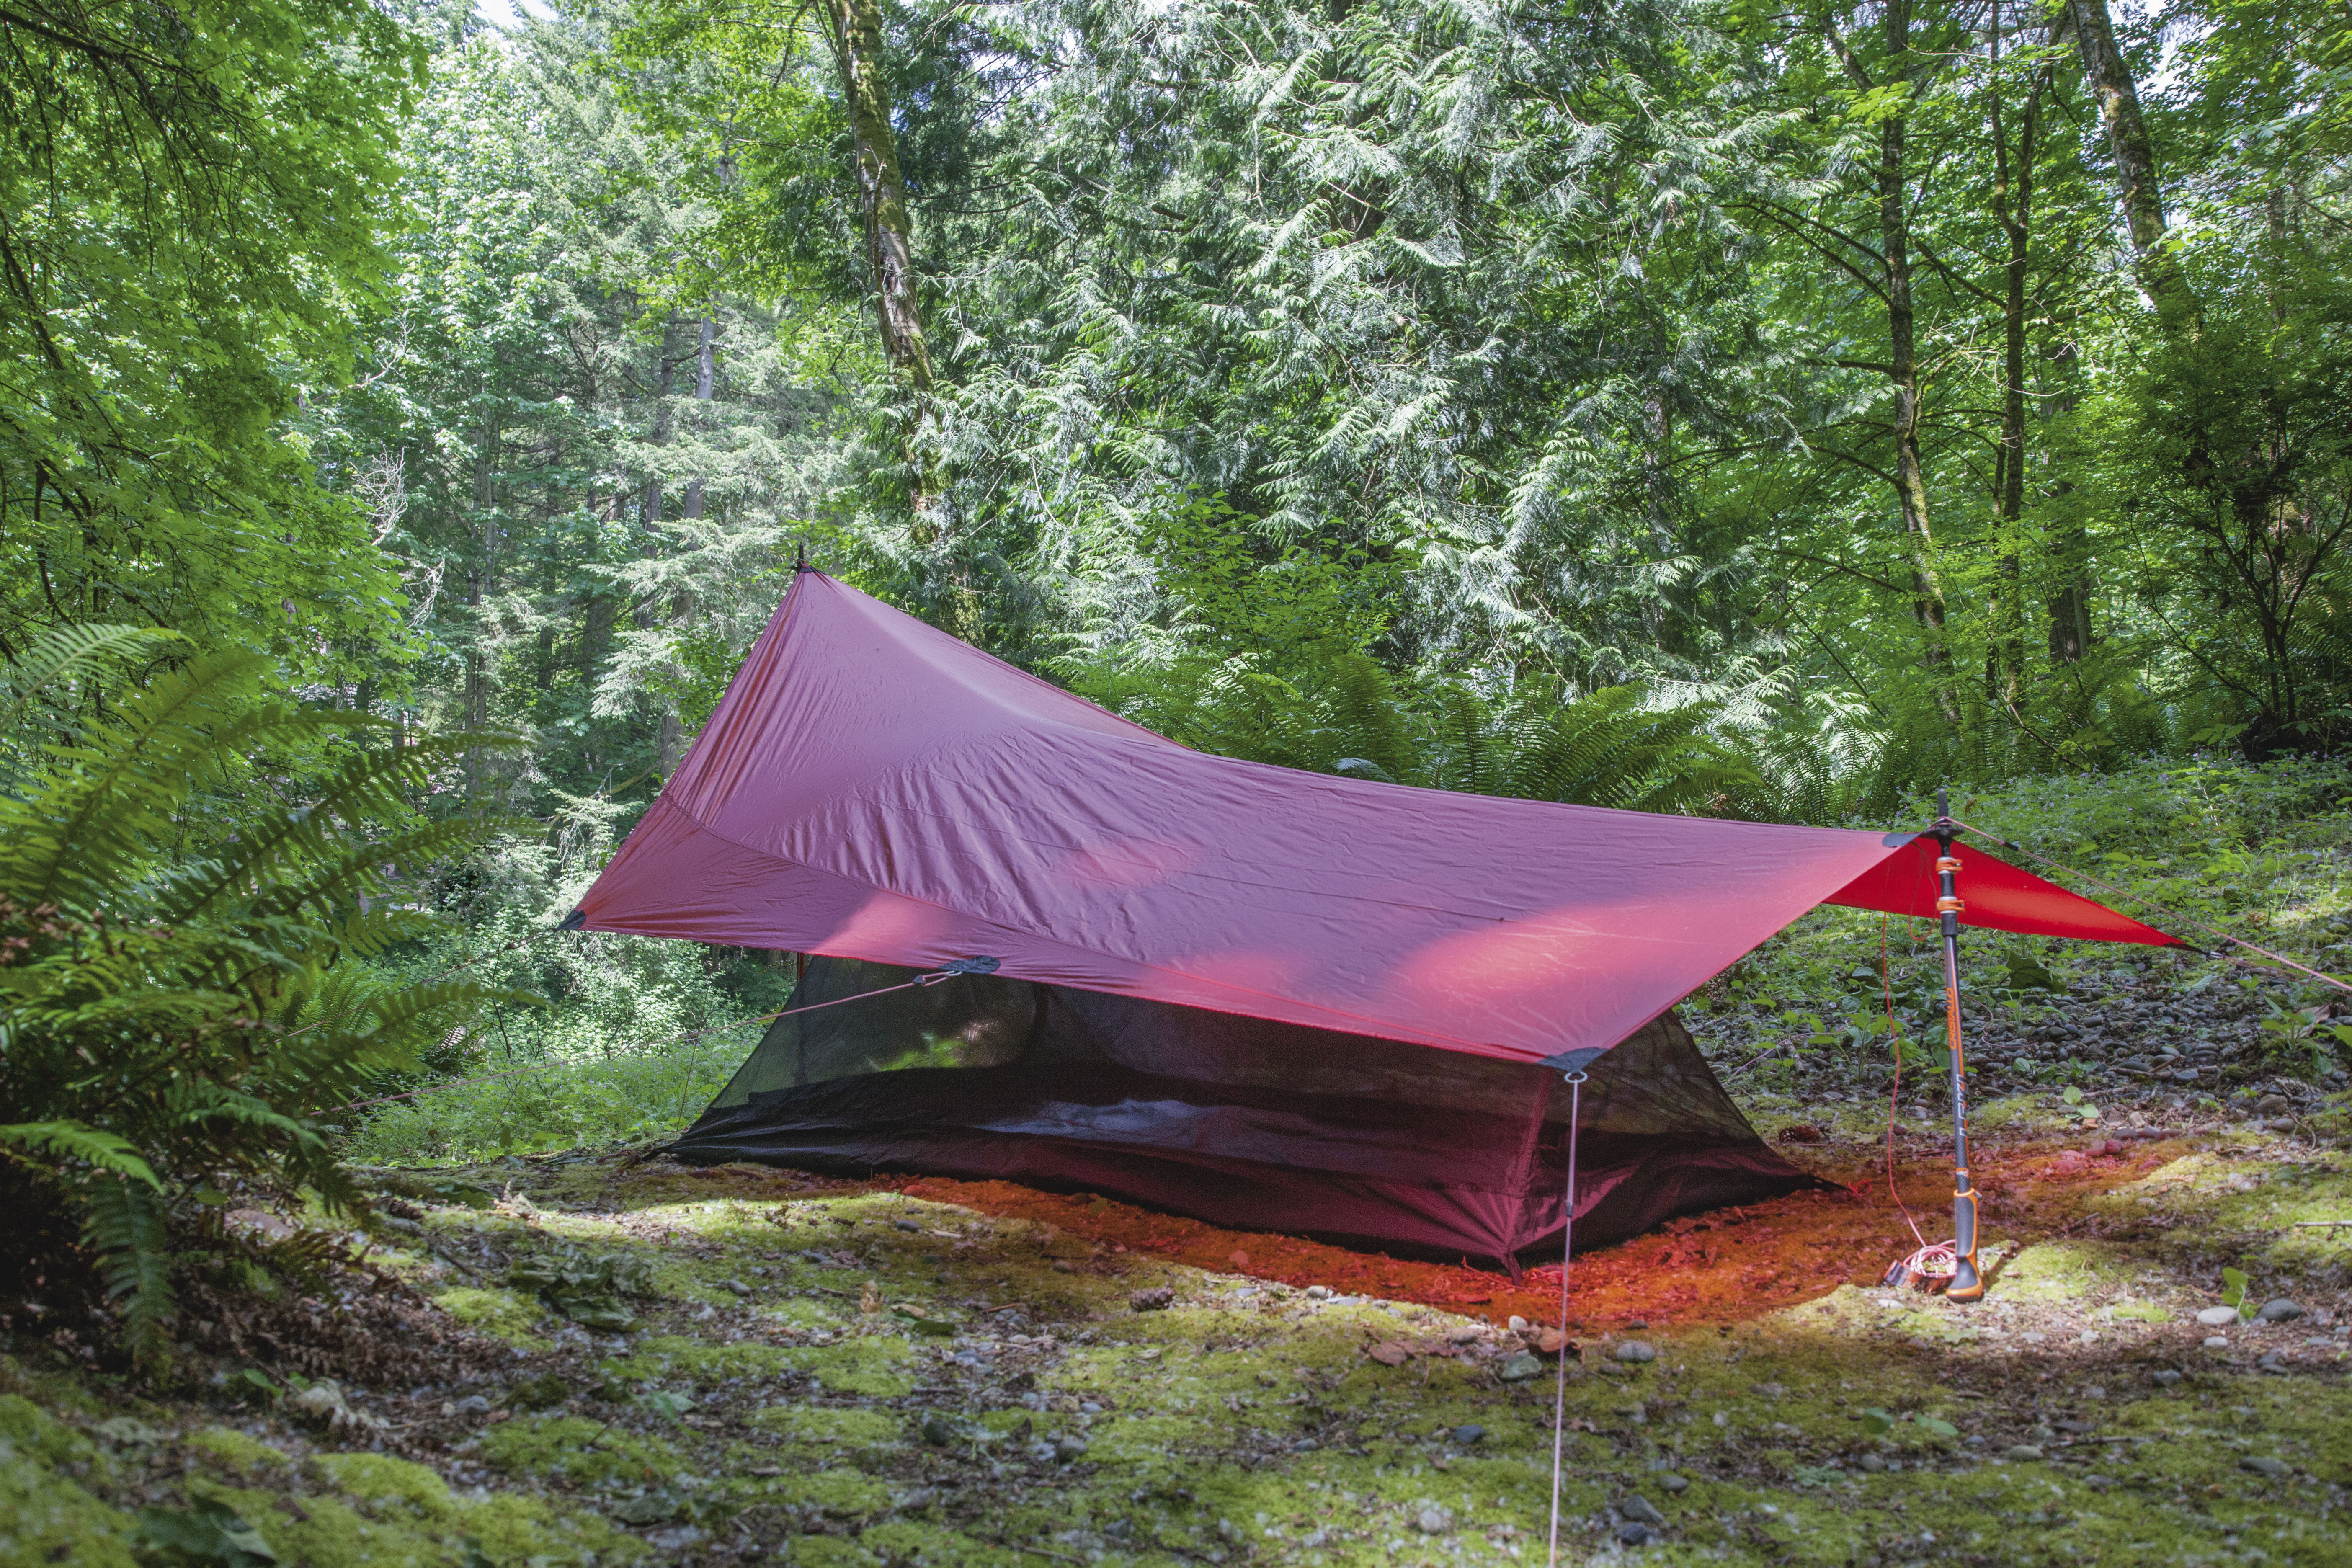 hilleberg mesh tent 1 backpackinglightdk